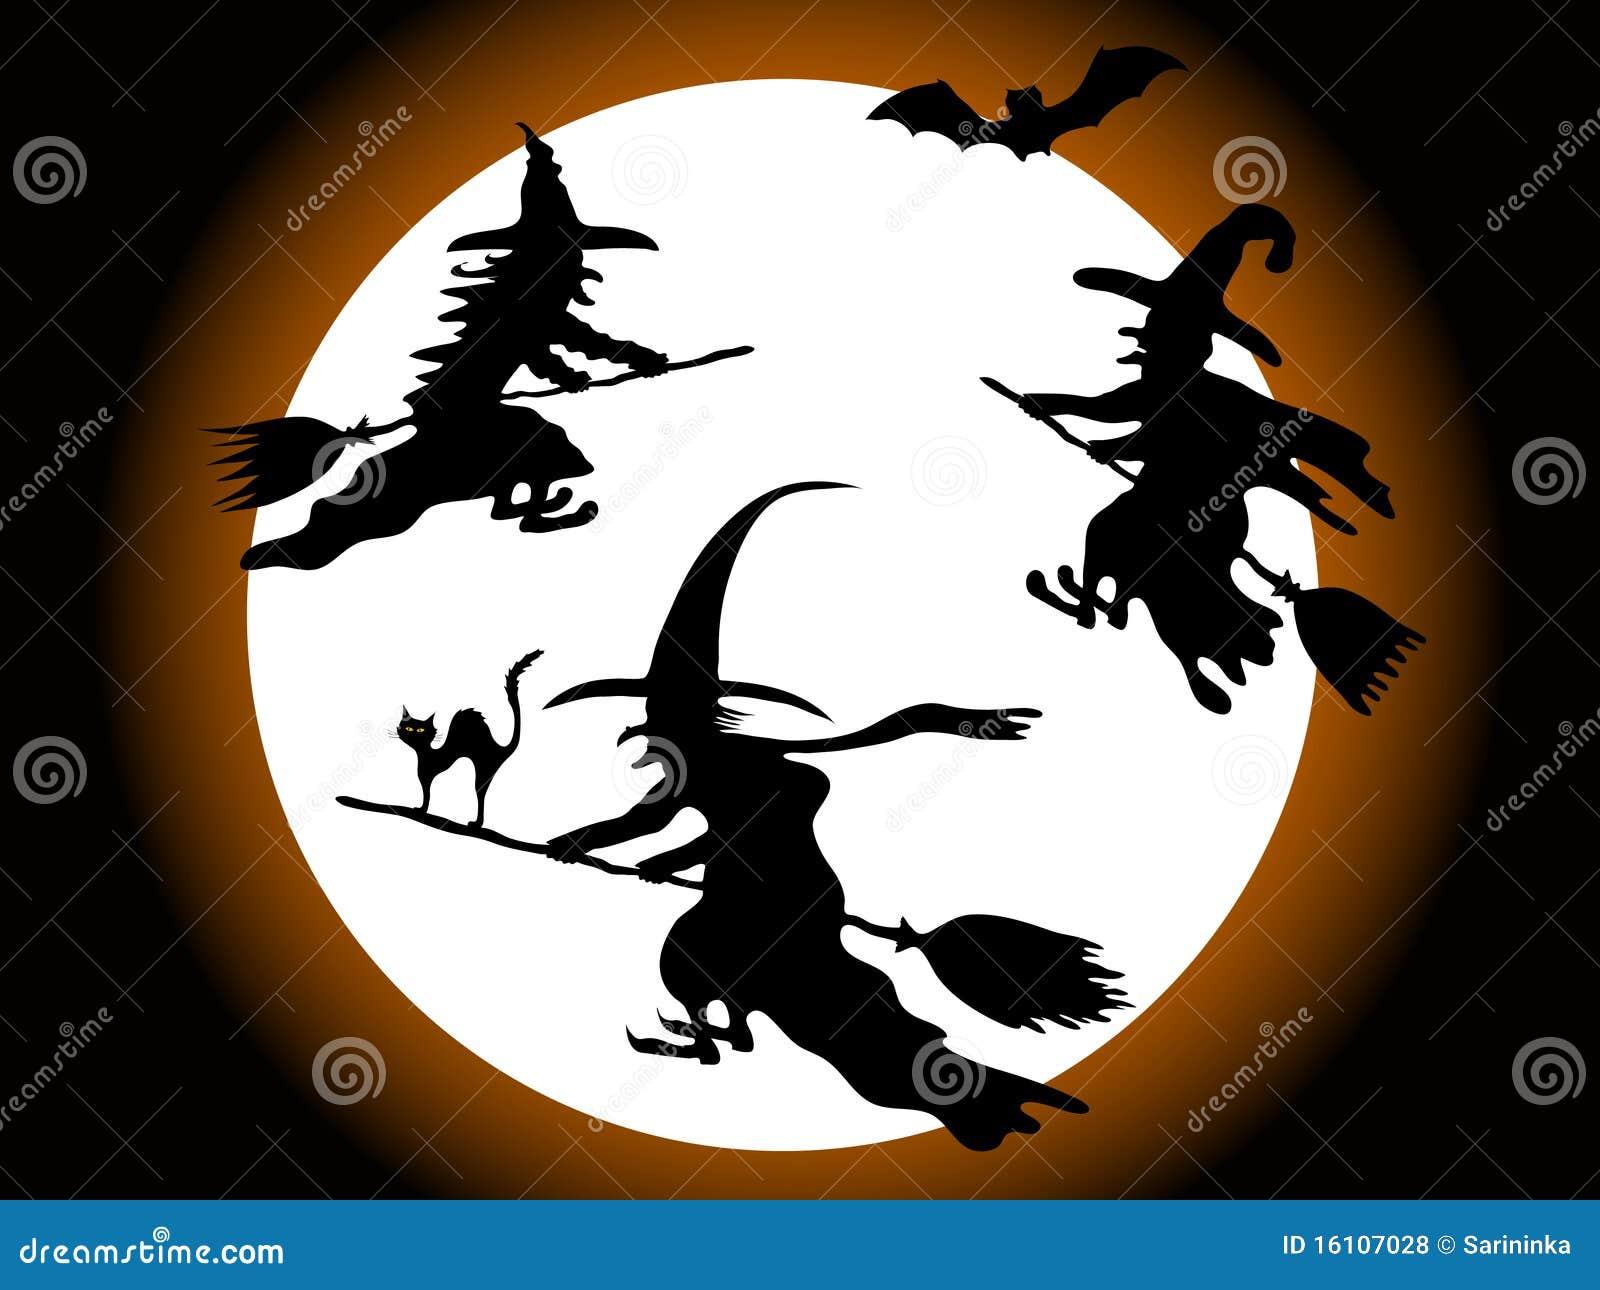 clipart halloween hexen - photo #36